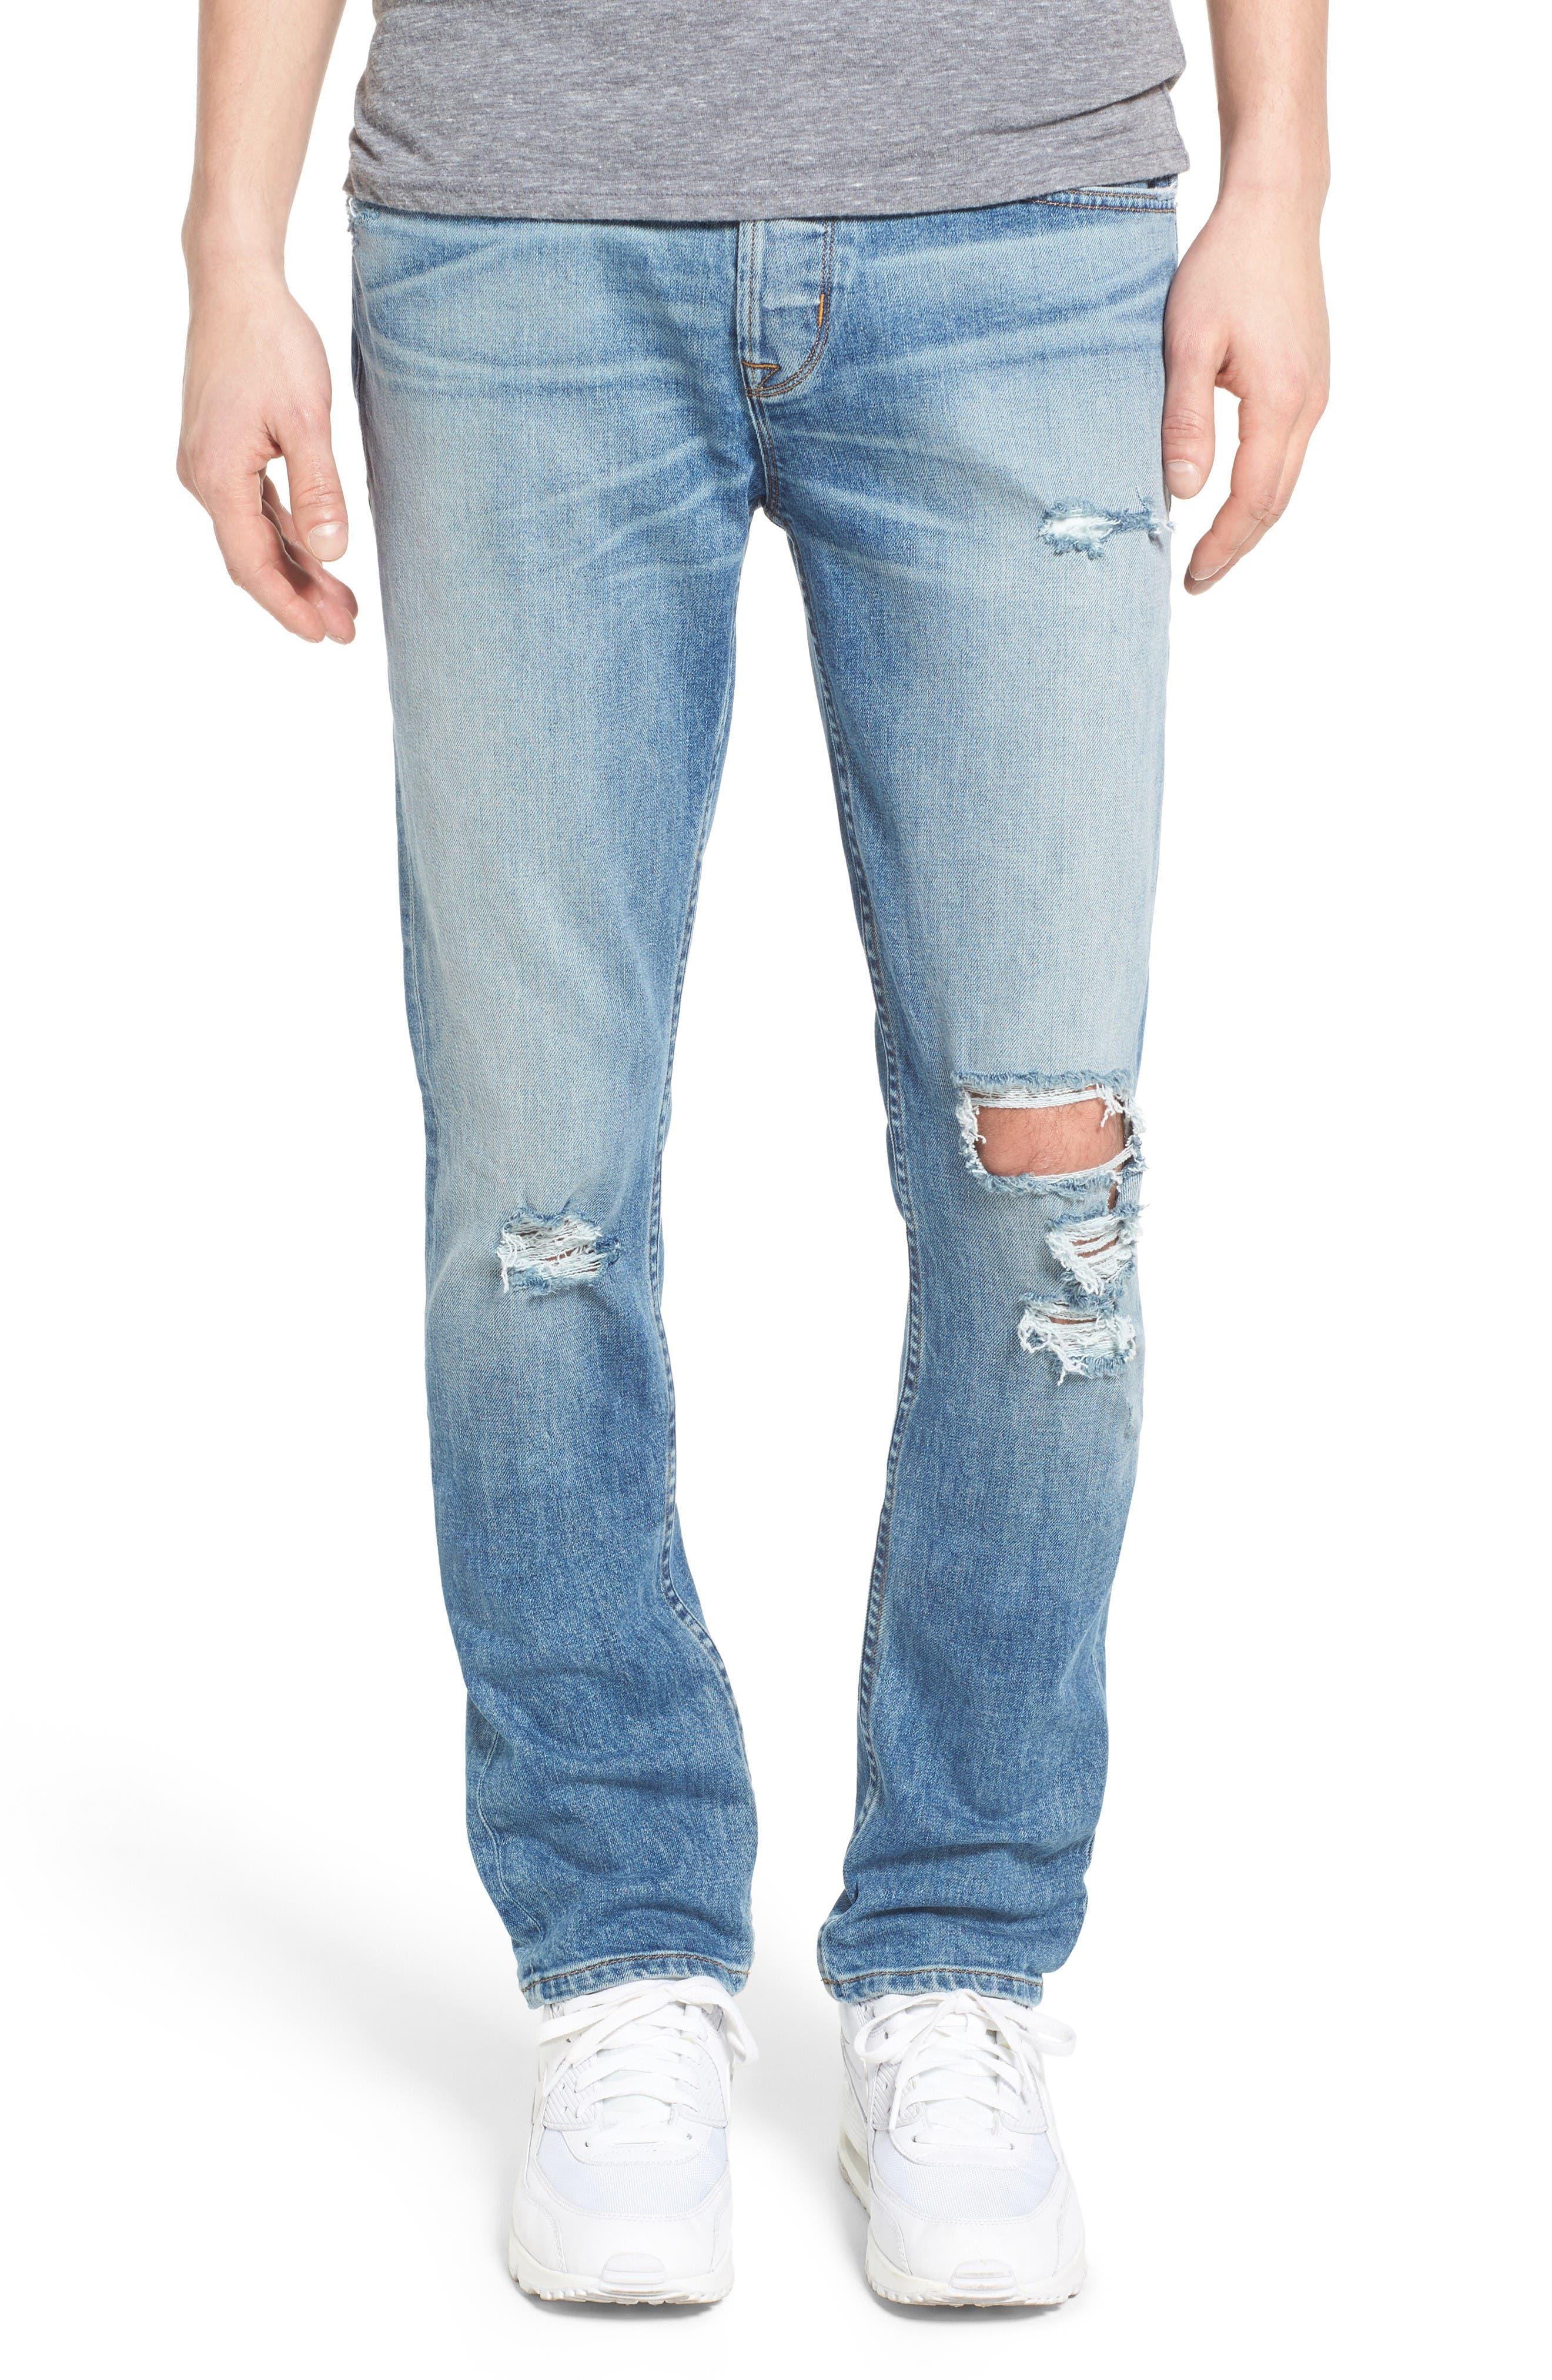 Main Image - Hudson Jeans Sator Skinny Fit Jeans (Banned)